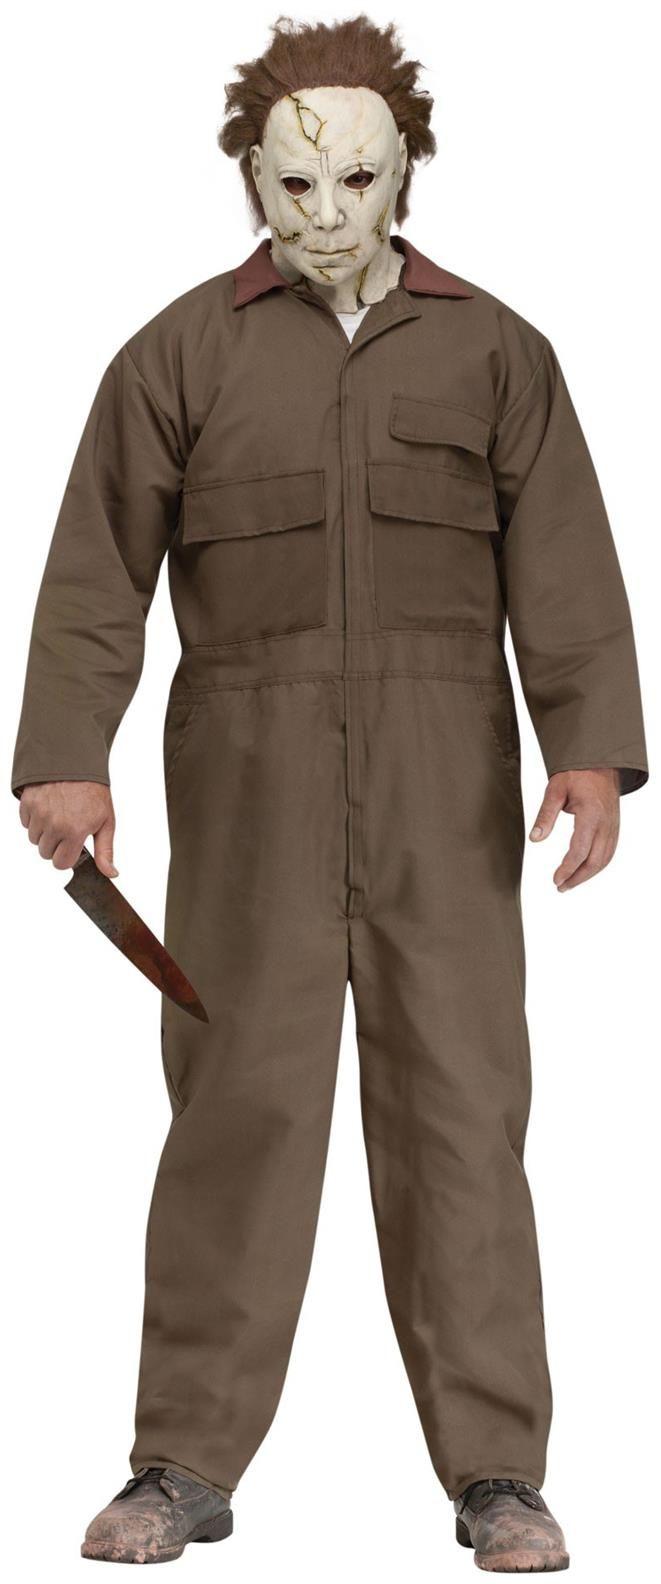 PartyBell.com - Michael Myers Adult #HalloweenCostume